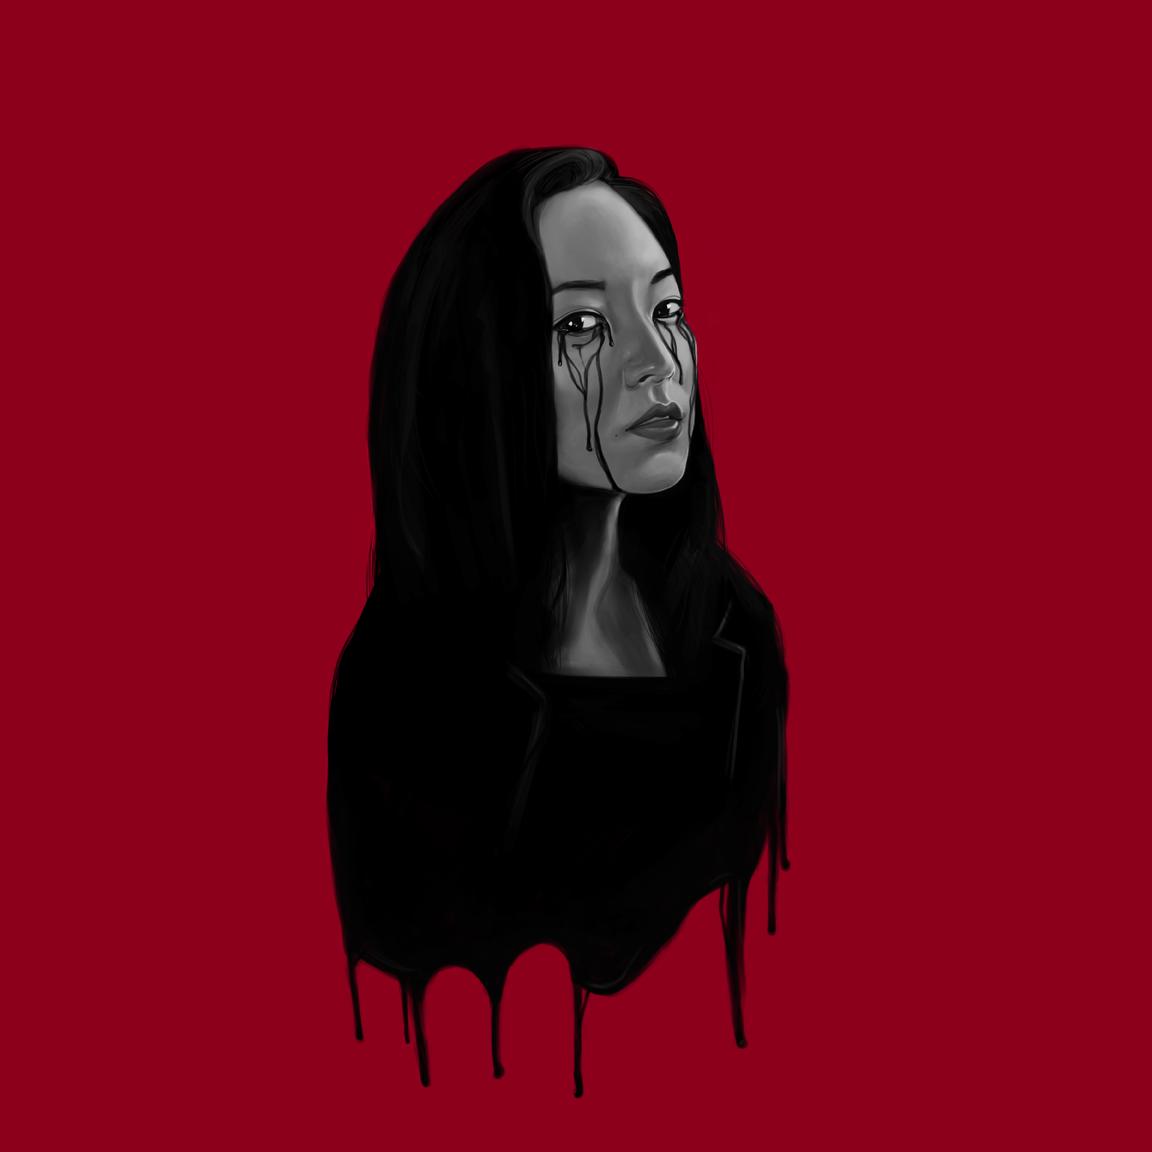 teenwolf_infected_kira